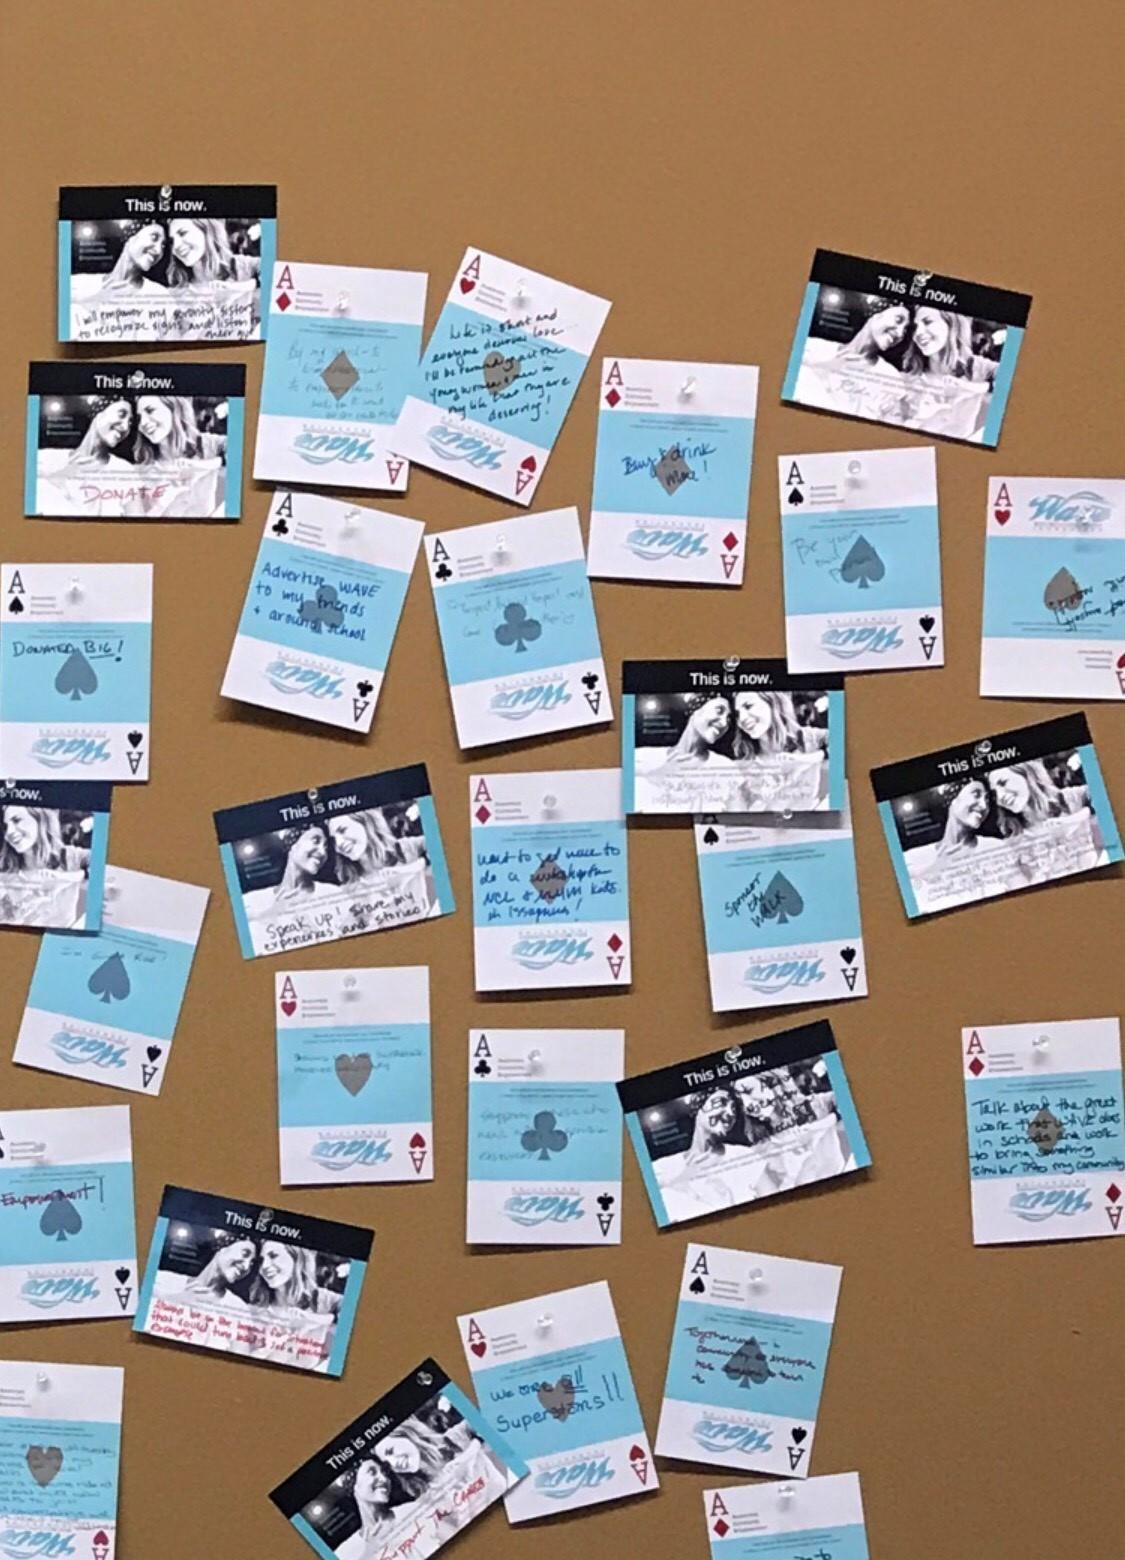 WAVE_cards on bulletin board.jpg